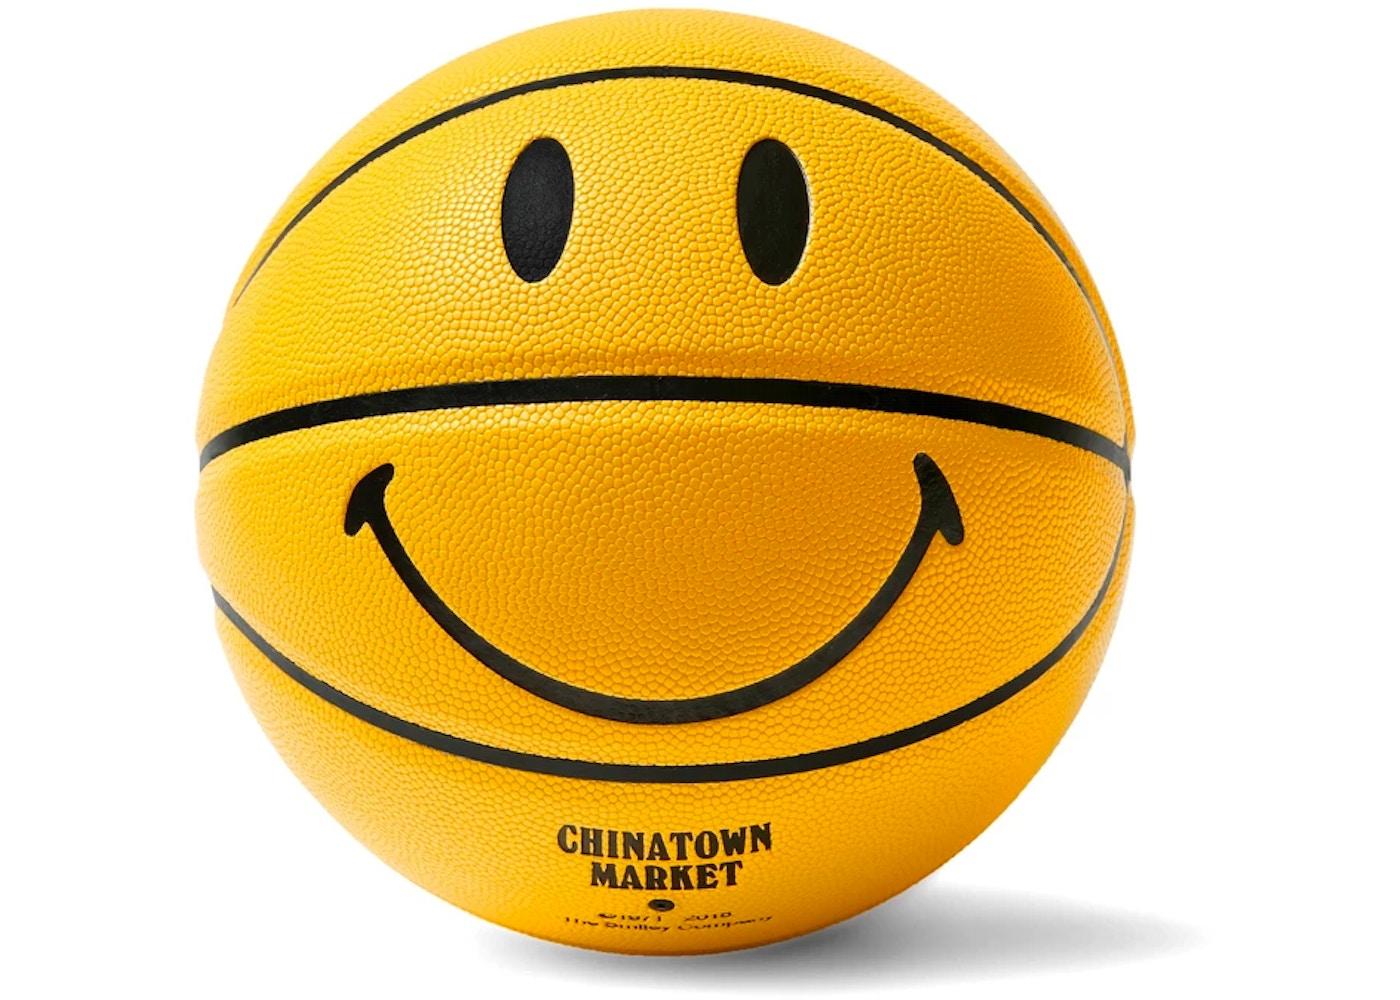 Chinatown Market Smiley Basketball Yellow - 2019